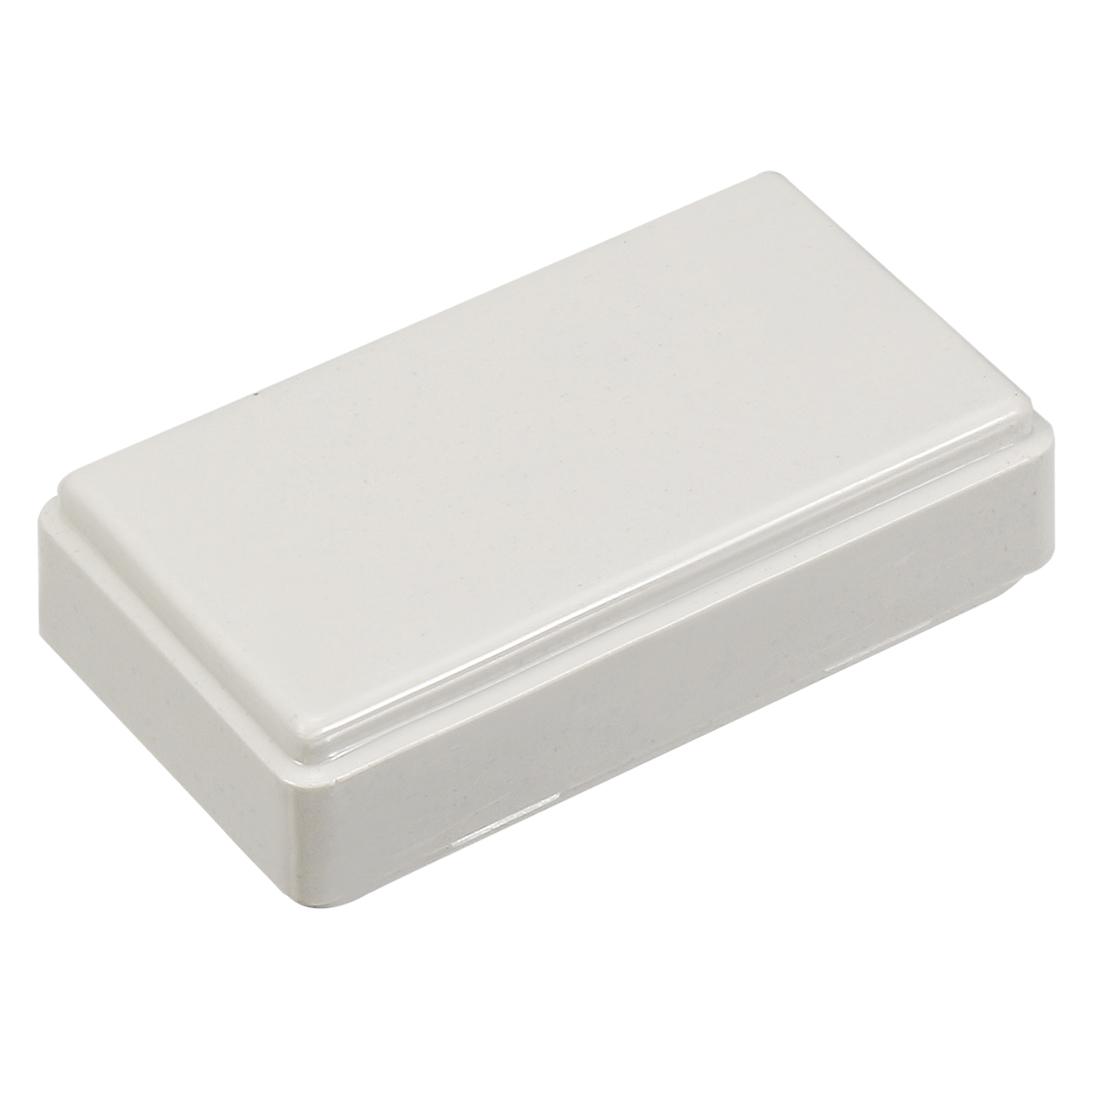 50mm x 25mm x 15mm Rectangular Beige Plastic Electric Case DIY Junction Box